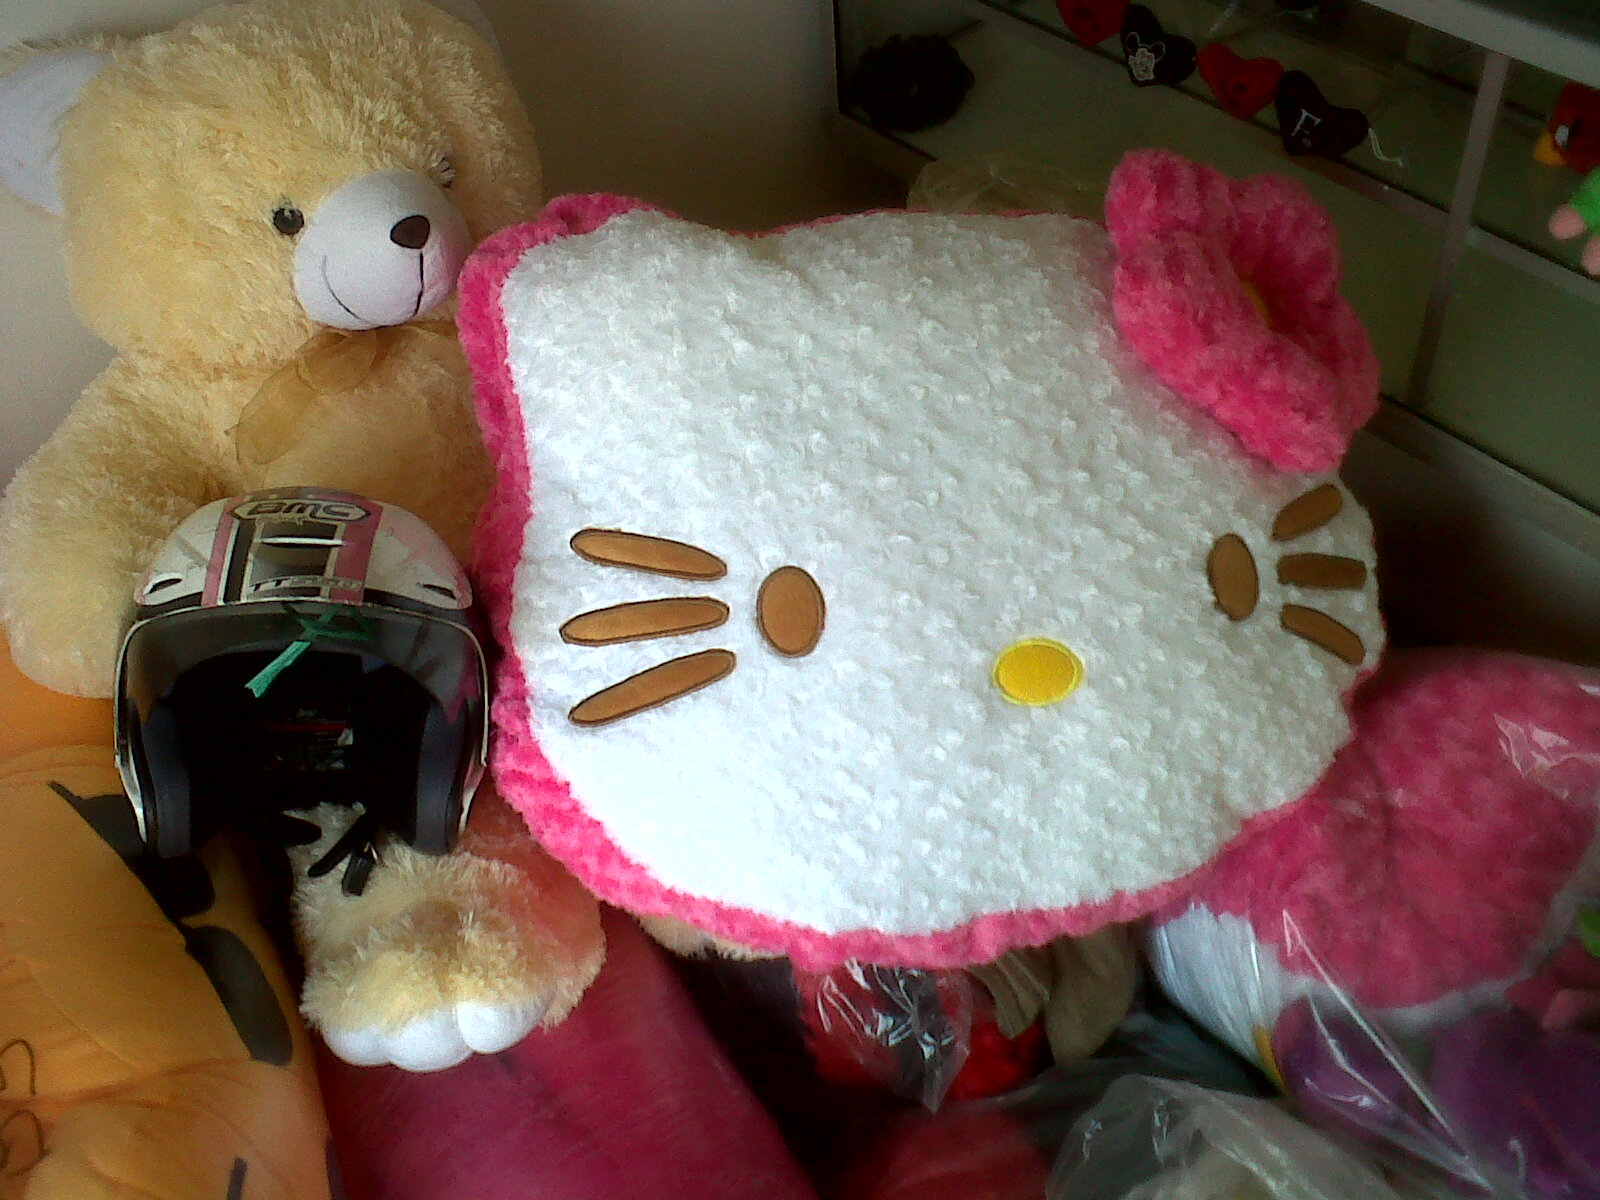 Hello Kitty Boneka Lucu Toko Online Jual Murah Keropi Jumbo Bantal Besar